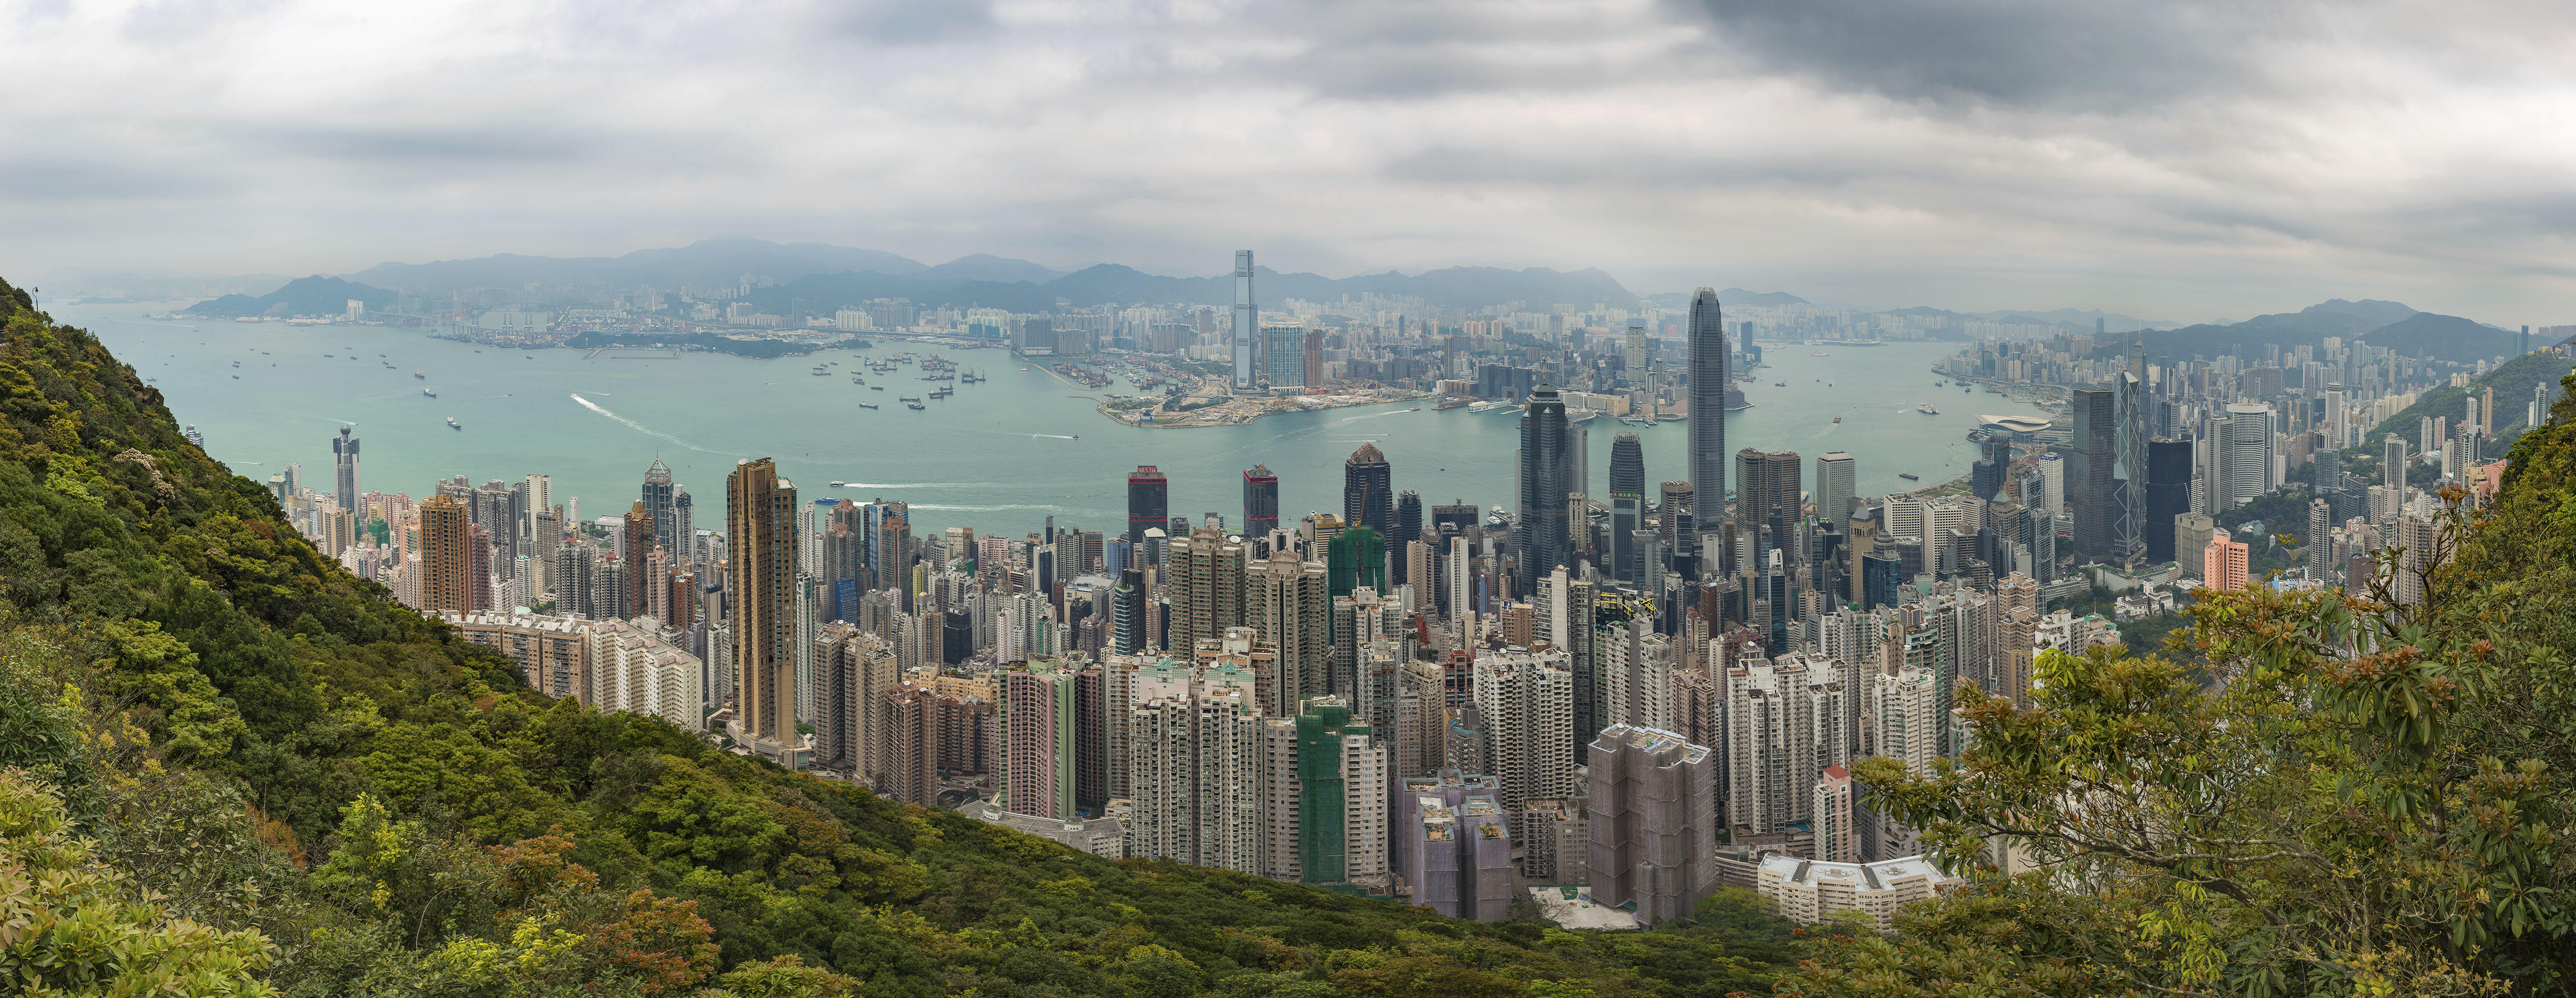 Обои Hong Kong, Гонконг, Китай, город